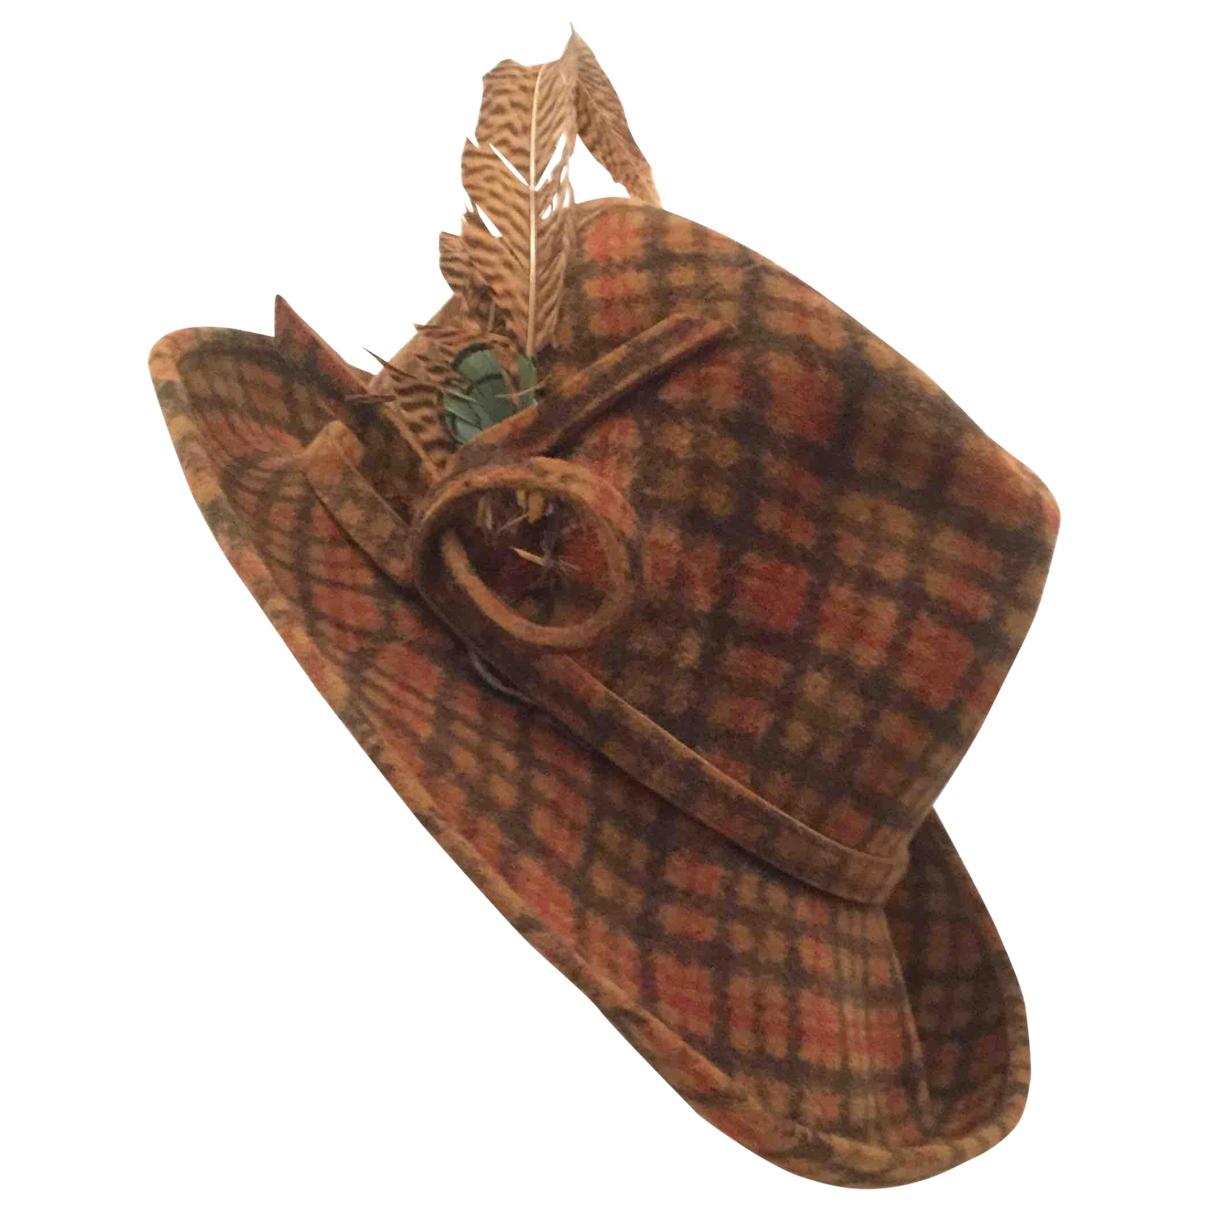 Sombrero Artisanal de Lana Non Signe / Unsigned